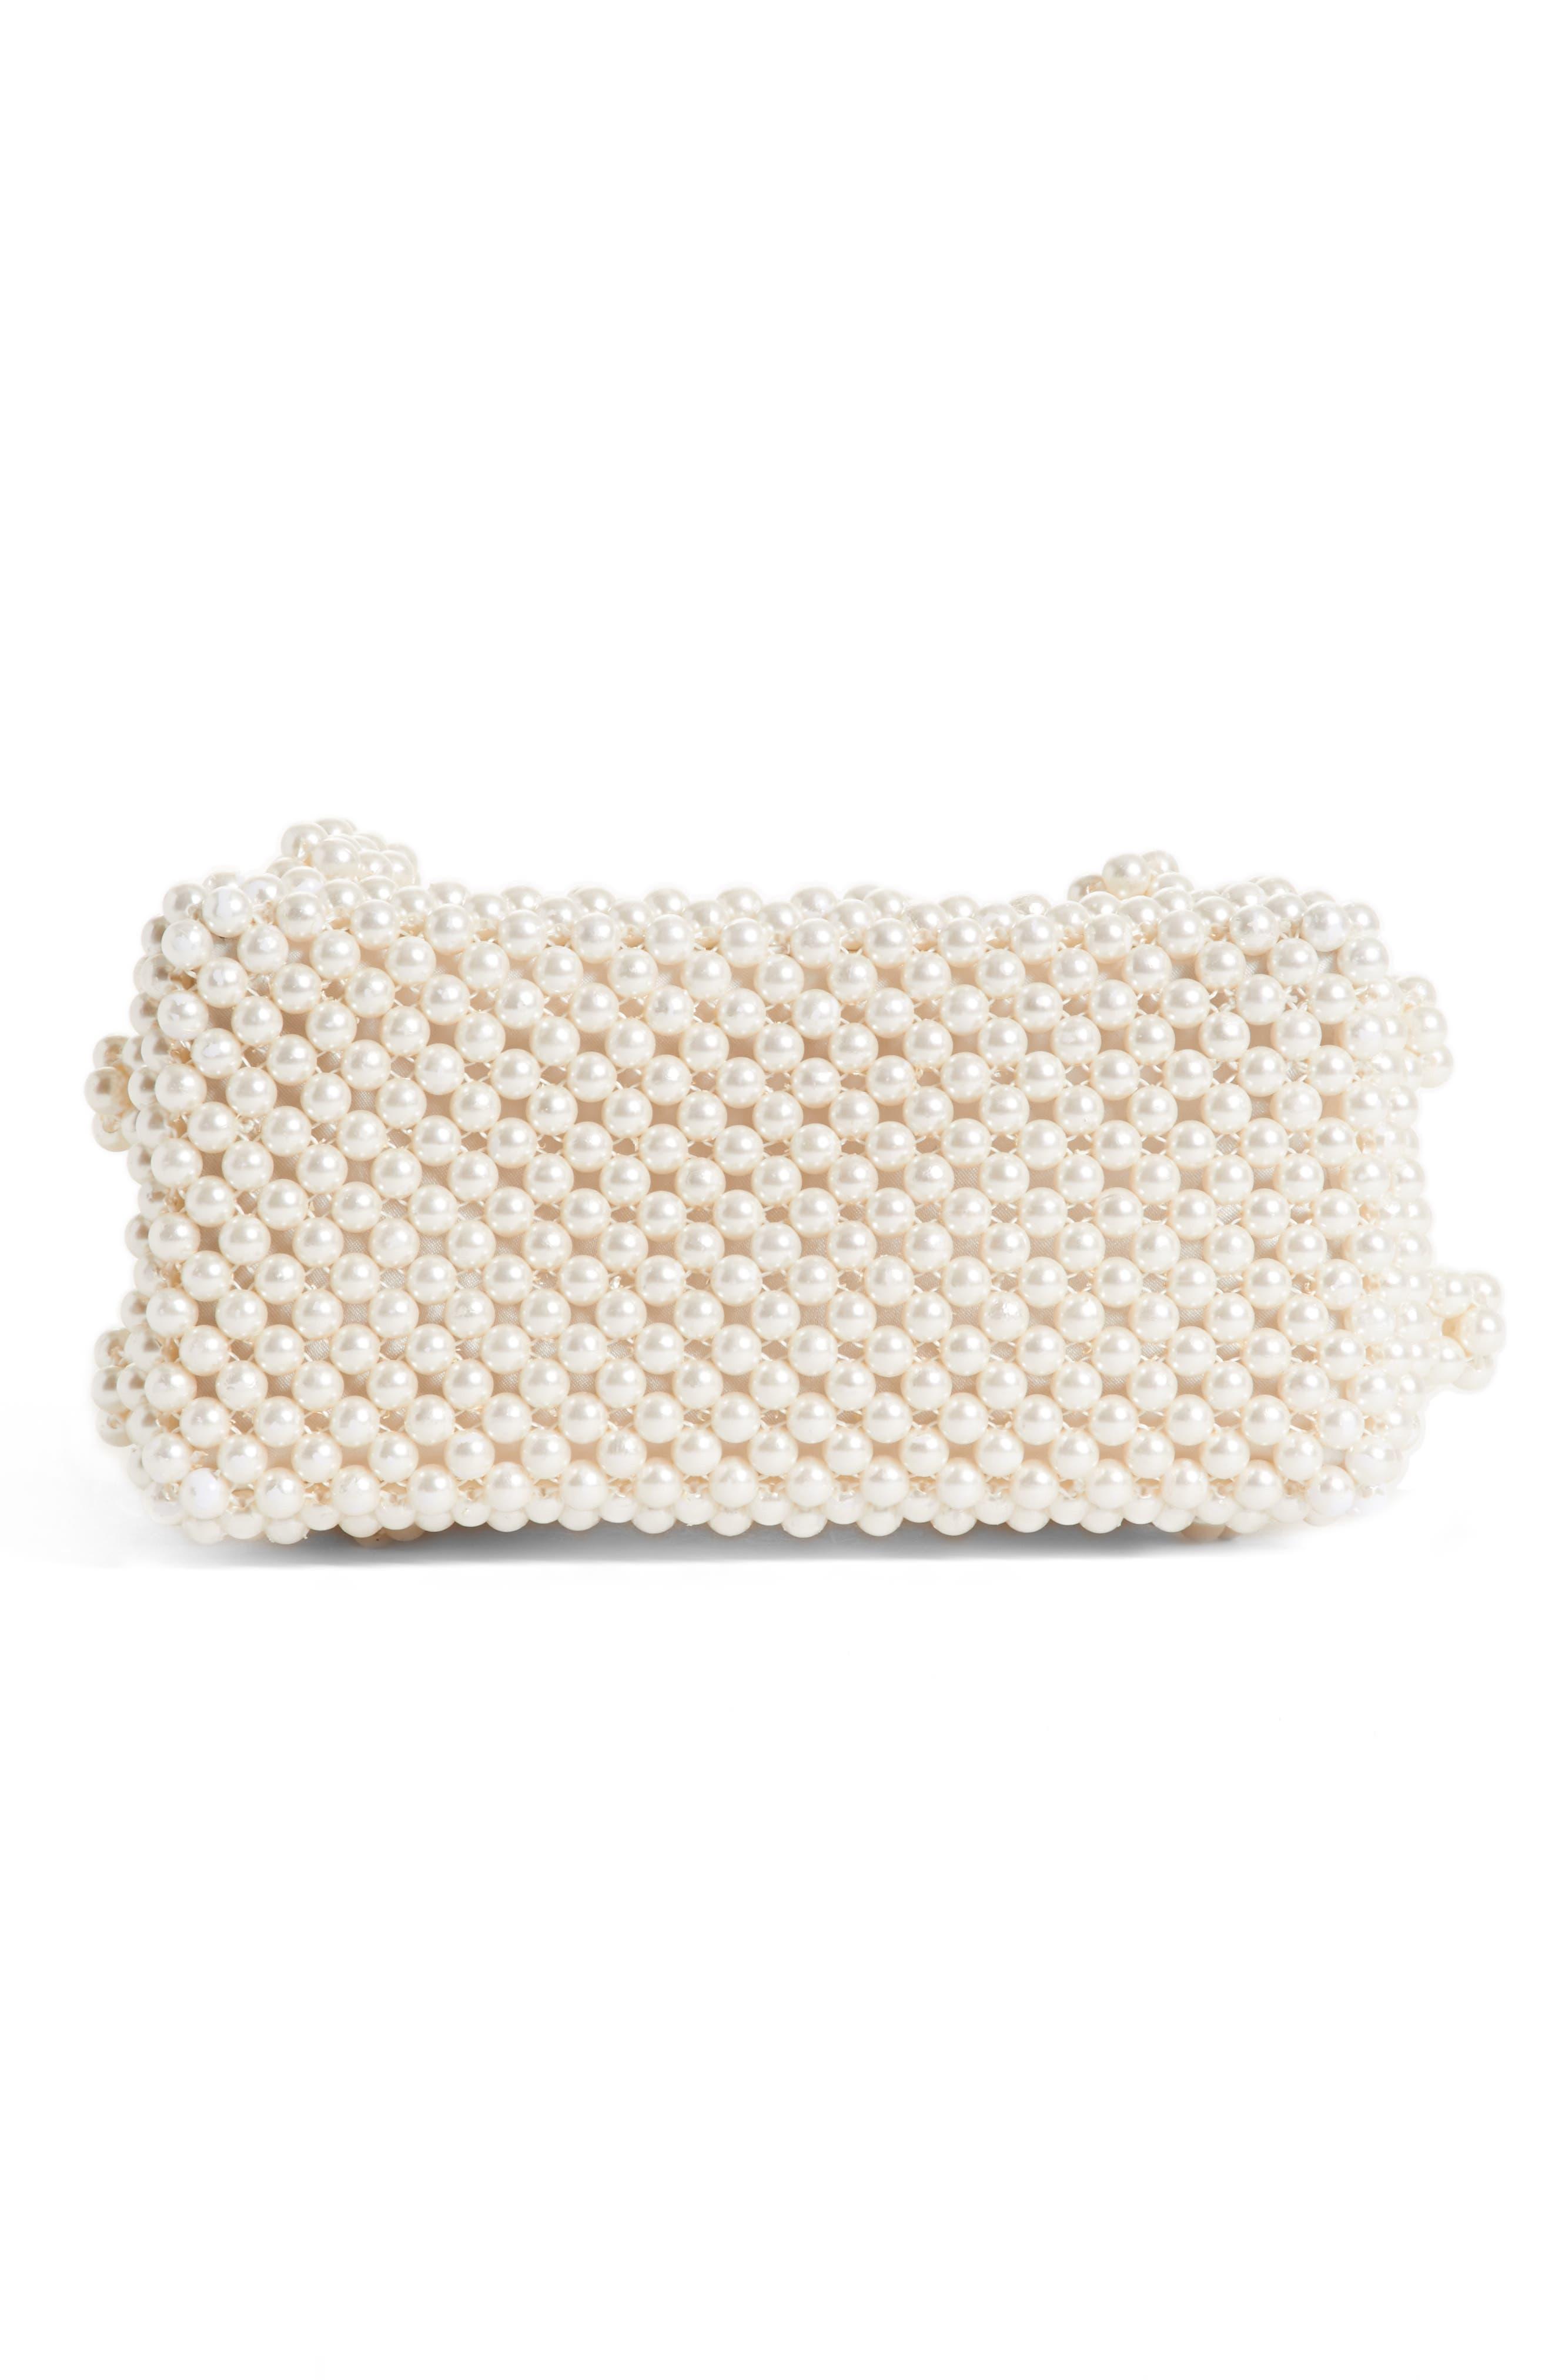 Antonia Small Imitation Pearl Beaded Handbag,                             Alternate thumbnail 6, color,                             Cream